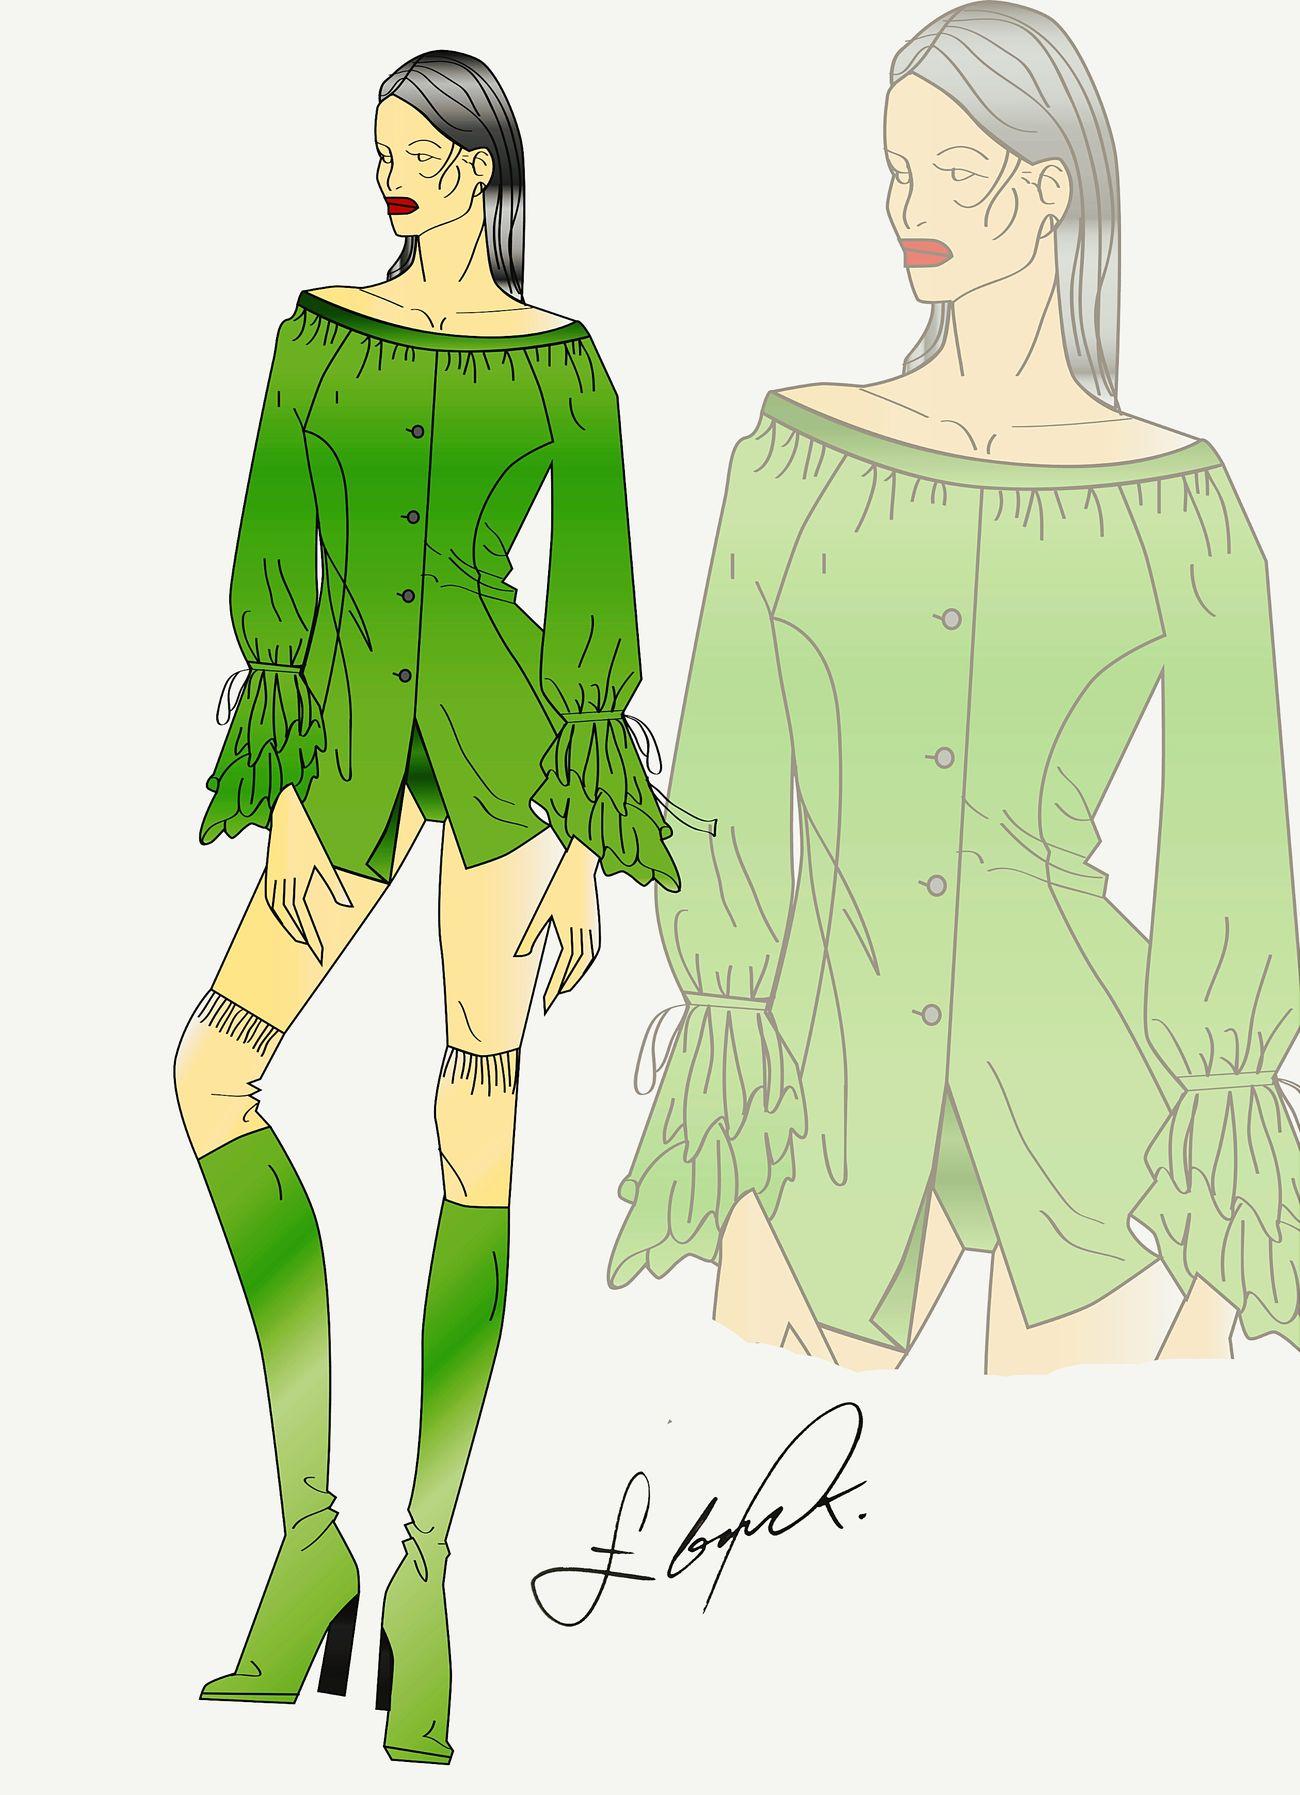 Woman Moda Modatasarımı Fashion Fashiondesign FashionDesigner Fashiondesignerlife Adobe Adobephotoshop Adobeillustrator